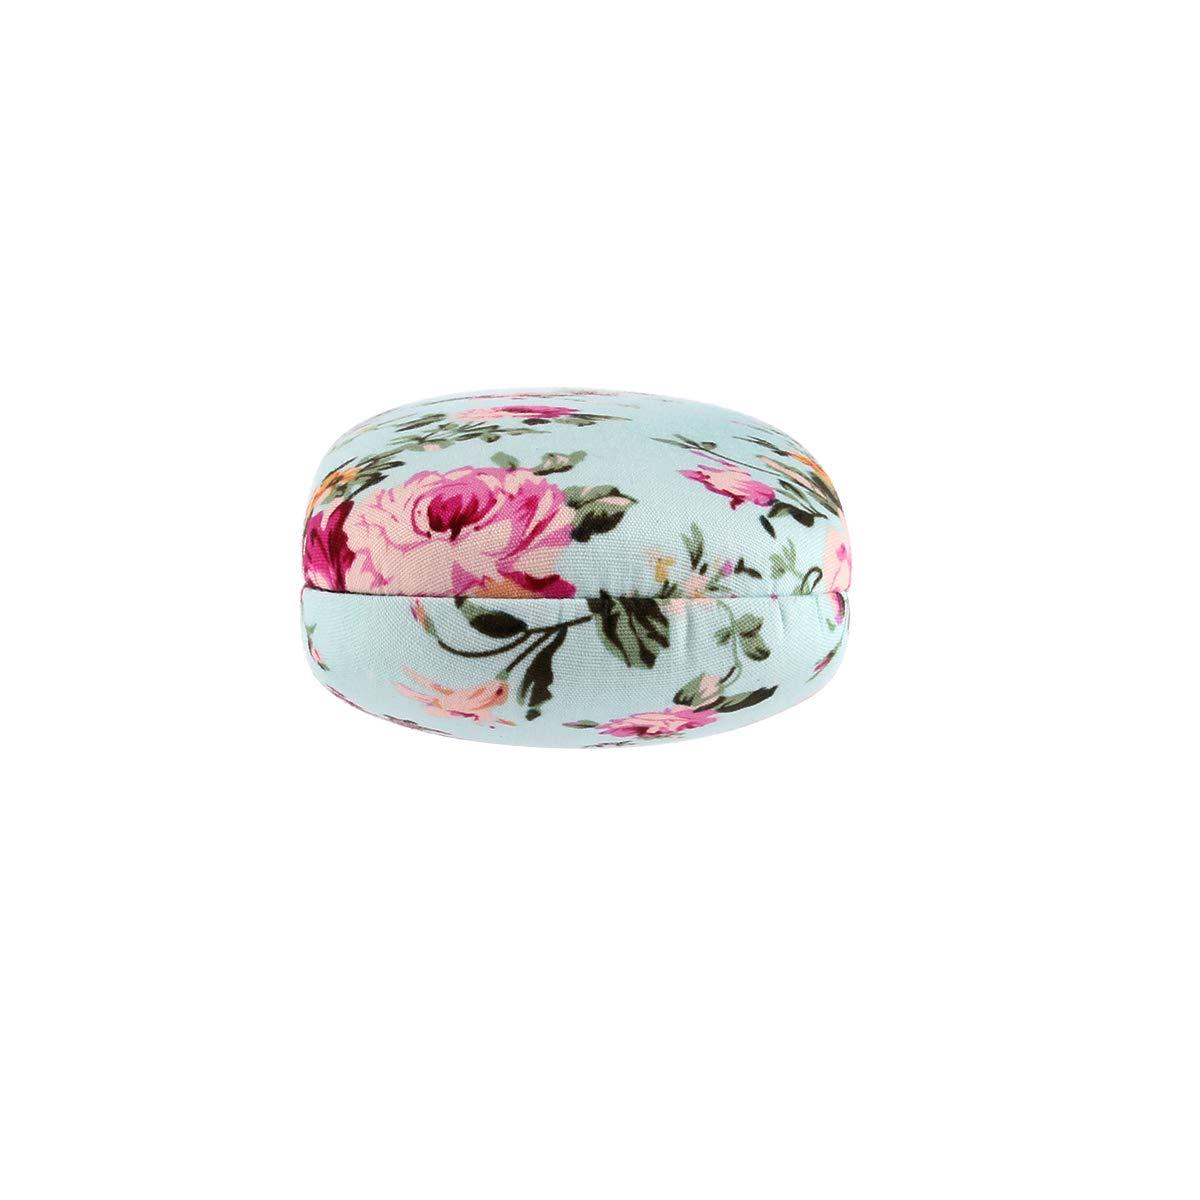 EZESO Fabrics Floral Retro Light Portable Eyeglasses Case (2 pcs blue+pink) by Ezeso (Image #7)